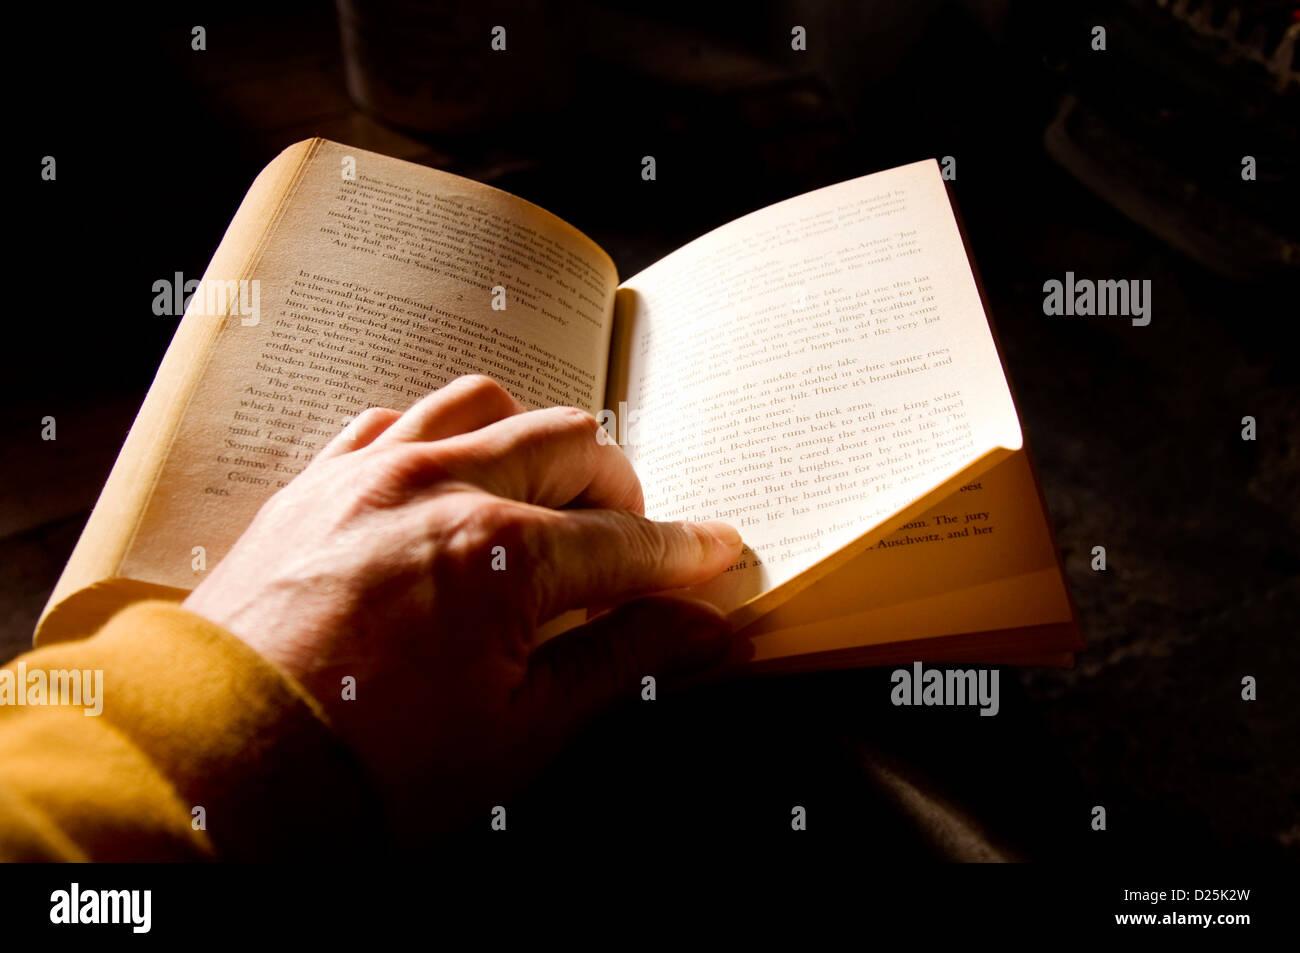 Reading a paperback novel - Stock Image